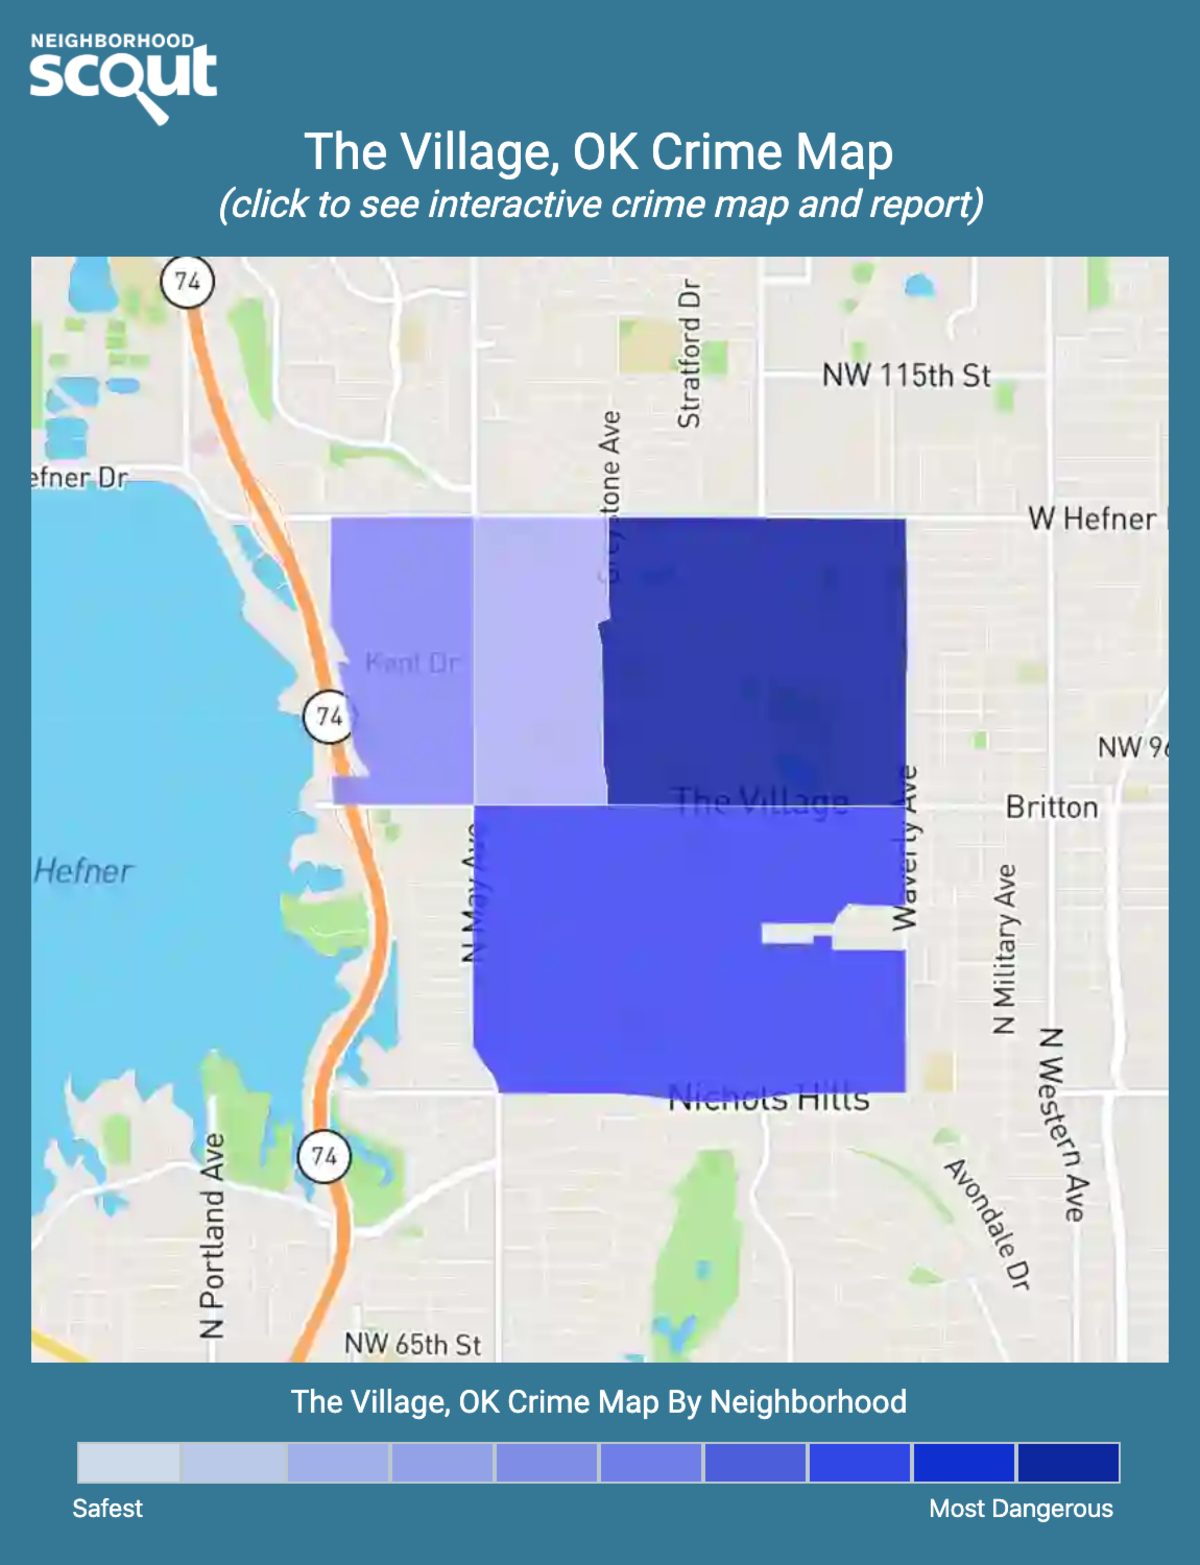 The Village, Oklahoma crime map